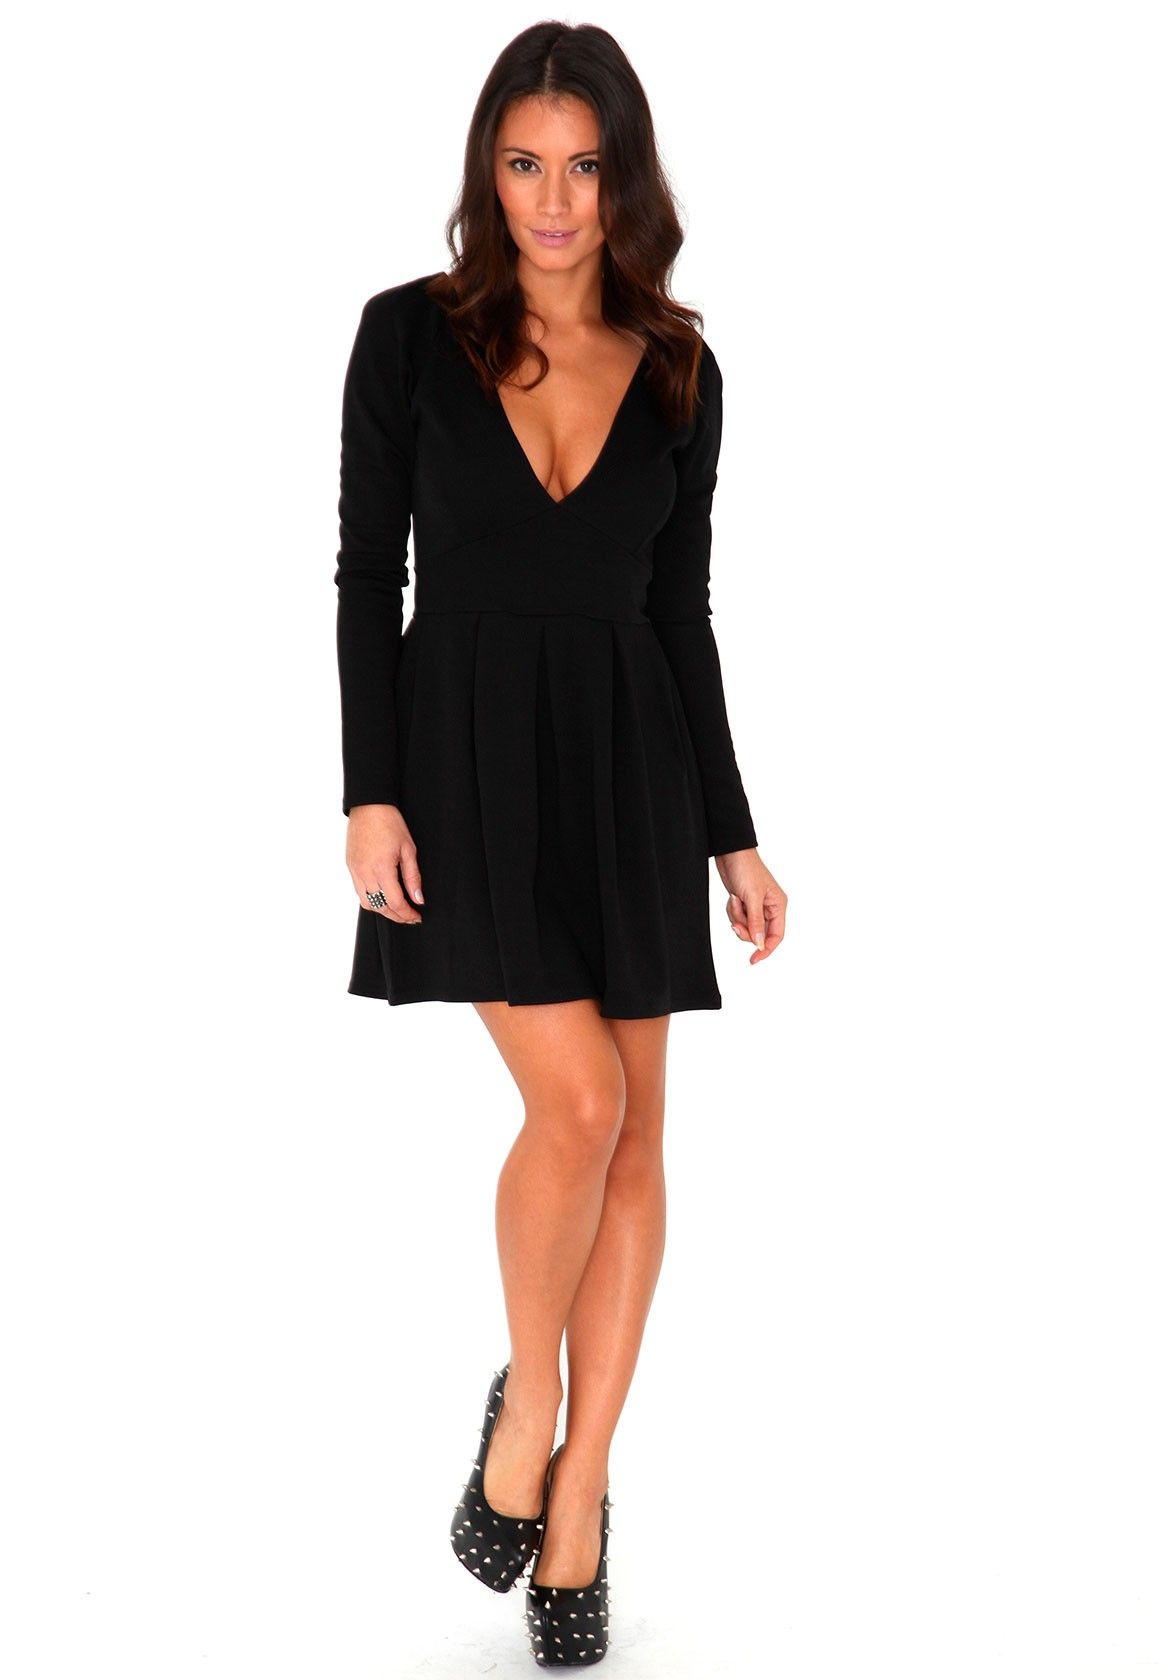 Jadin Fitted Long Sleeve Dress In Black Long Sleeve Fitted Dress Women Dress Online Dresses [ 1680 x 1160 Pixel ]